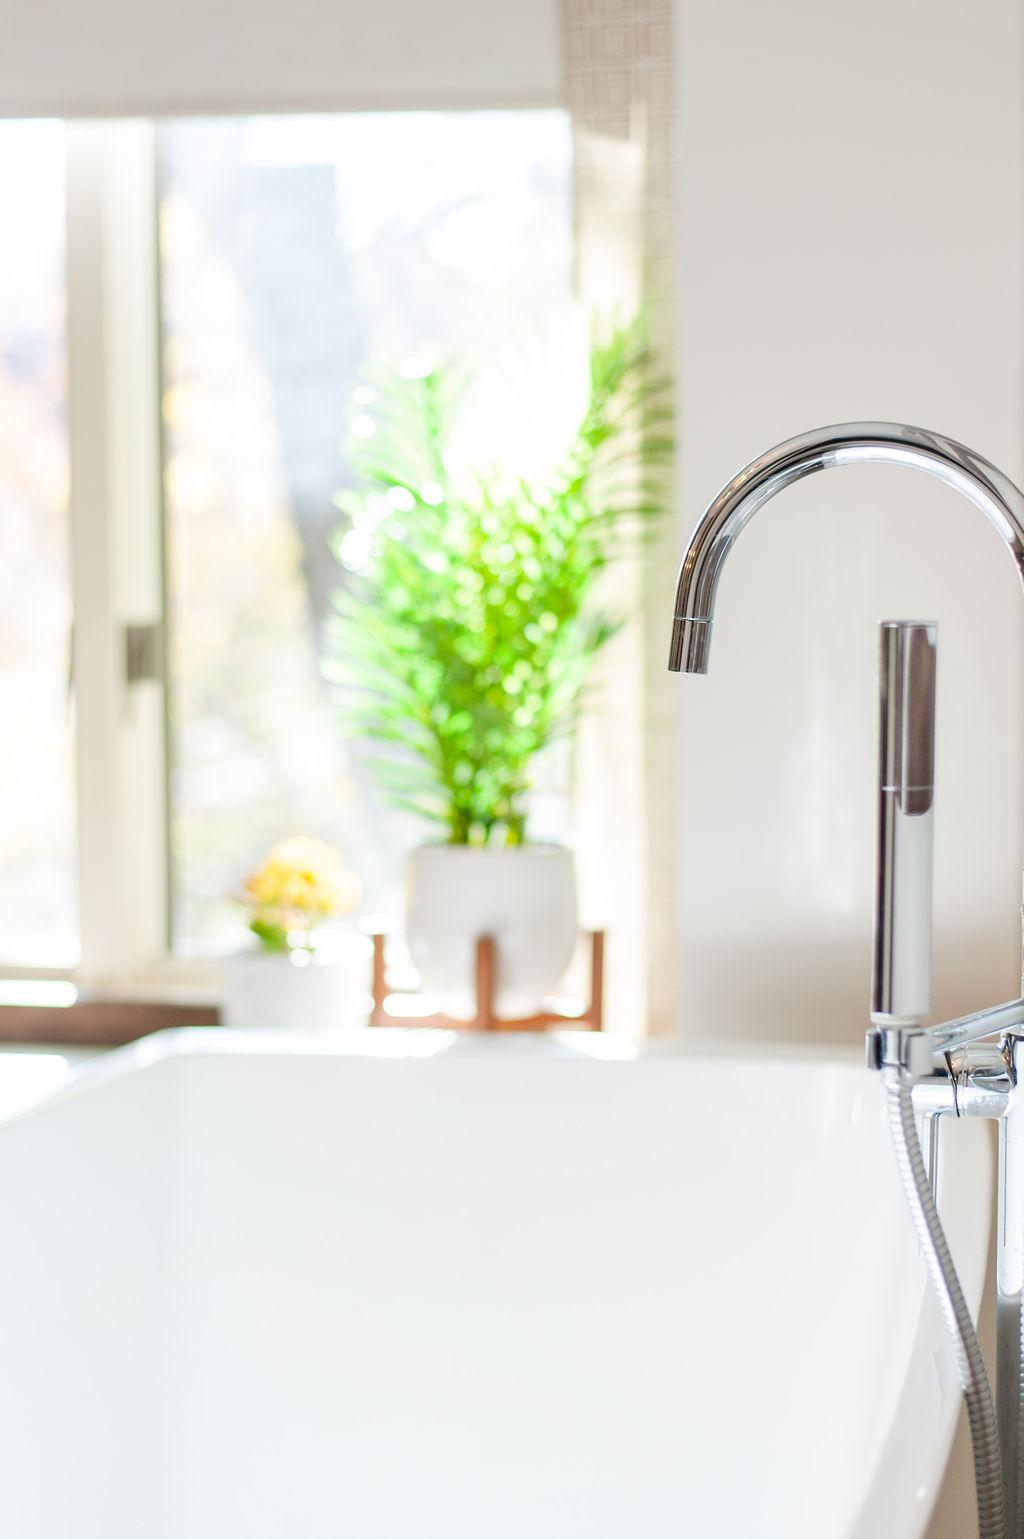 Blank-Canvas-Interior-Design-in-kansas-city-bathroom-tub-faucet.jpg